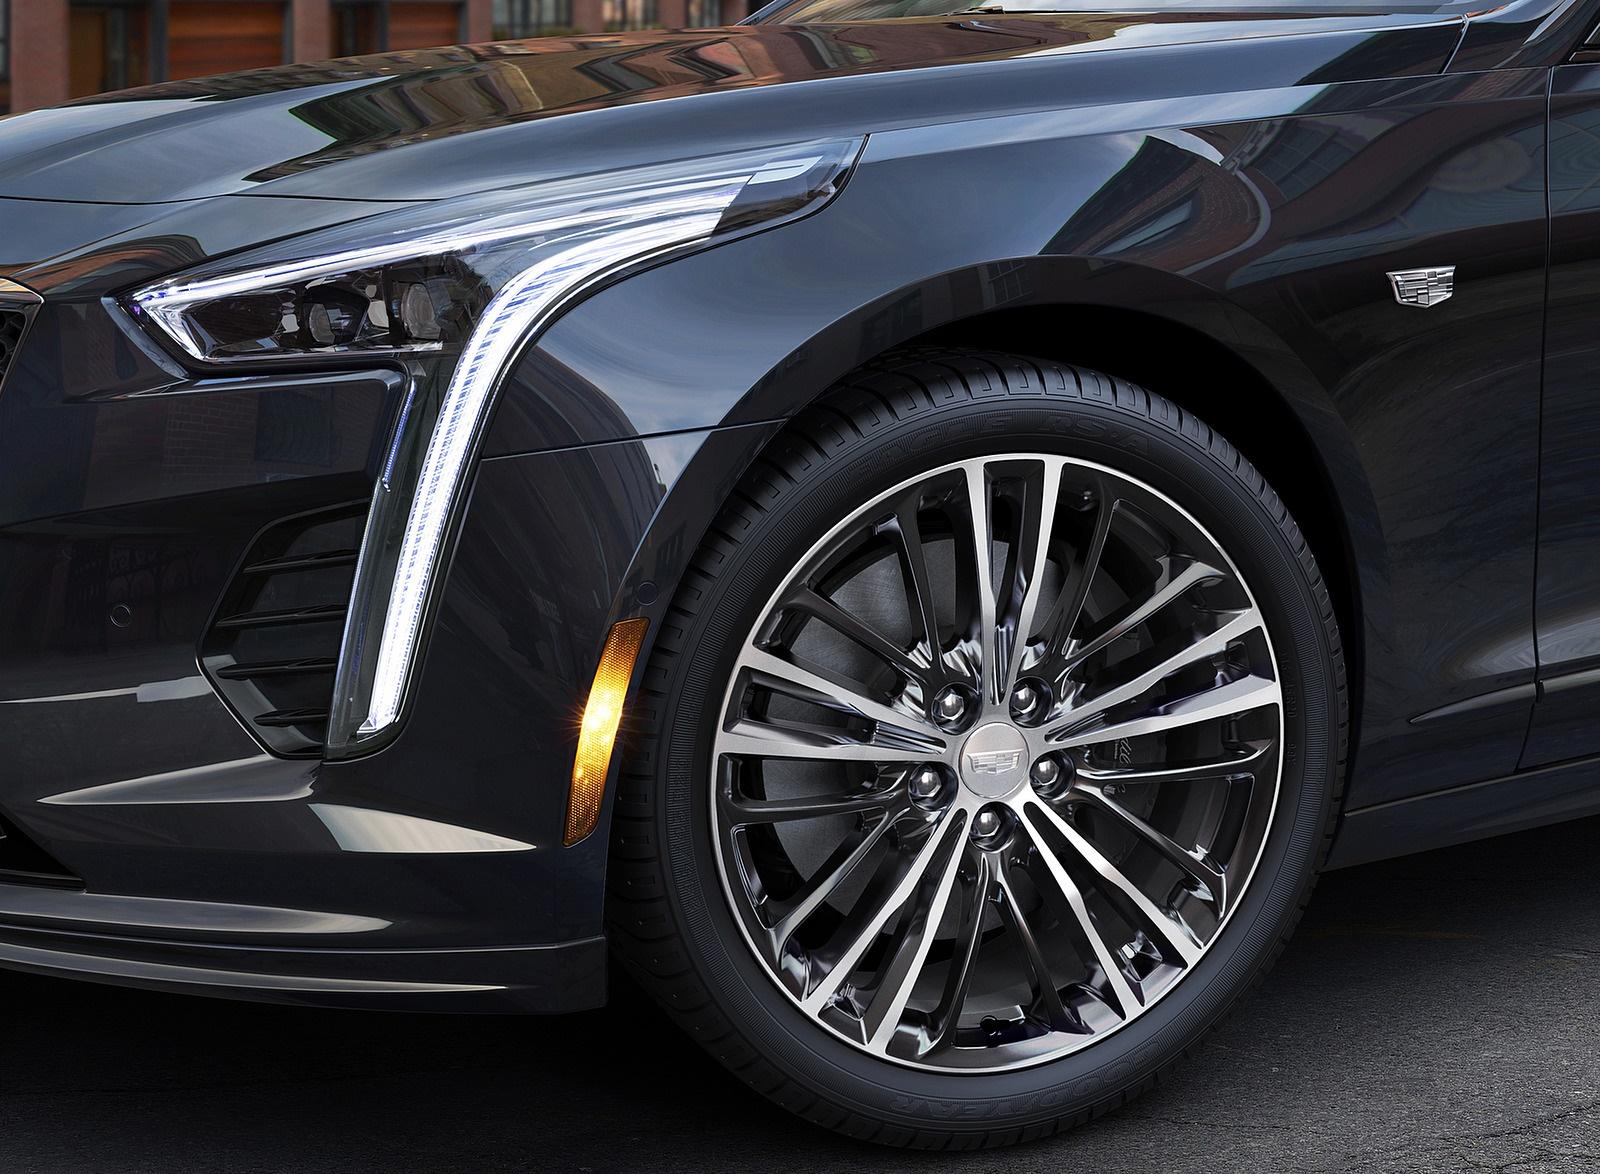 2019 Cadillac CT6 V-Sport Headlight Wallpapers (7)